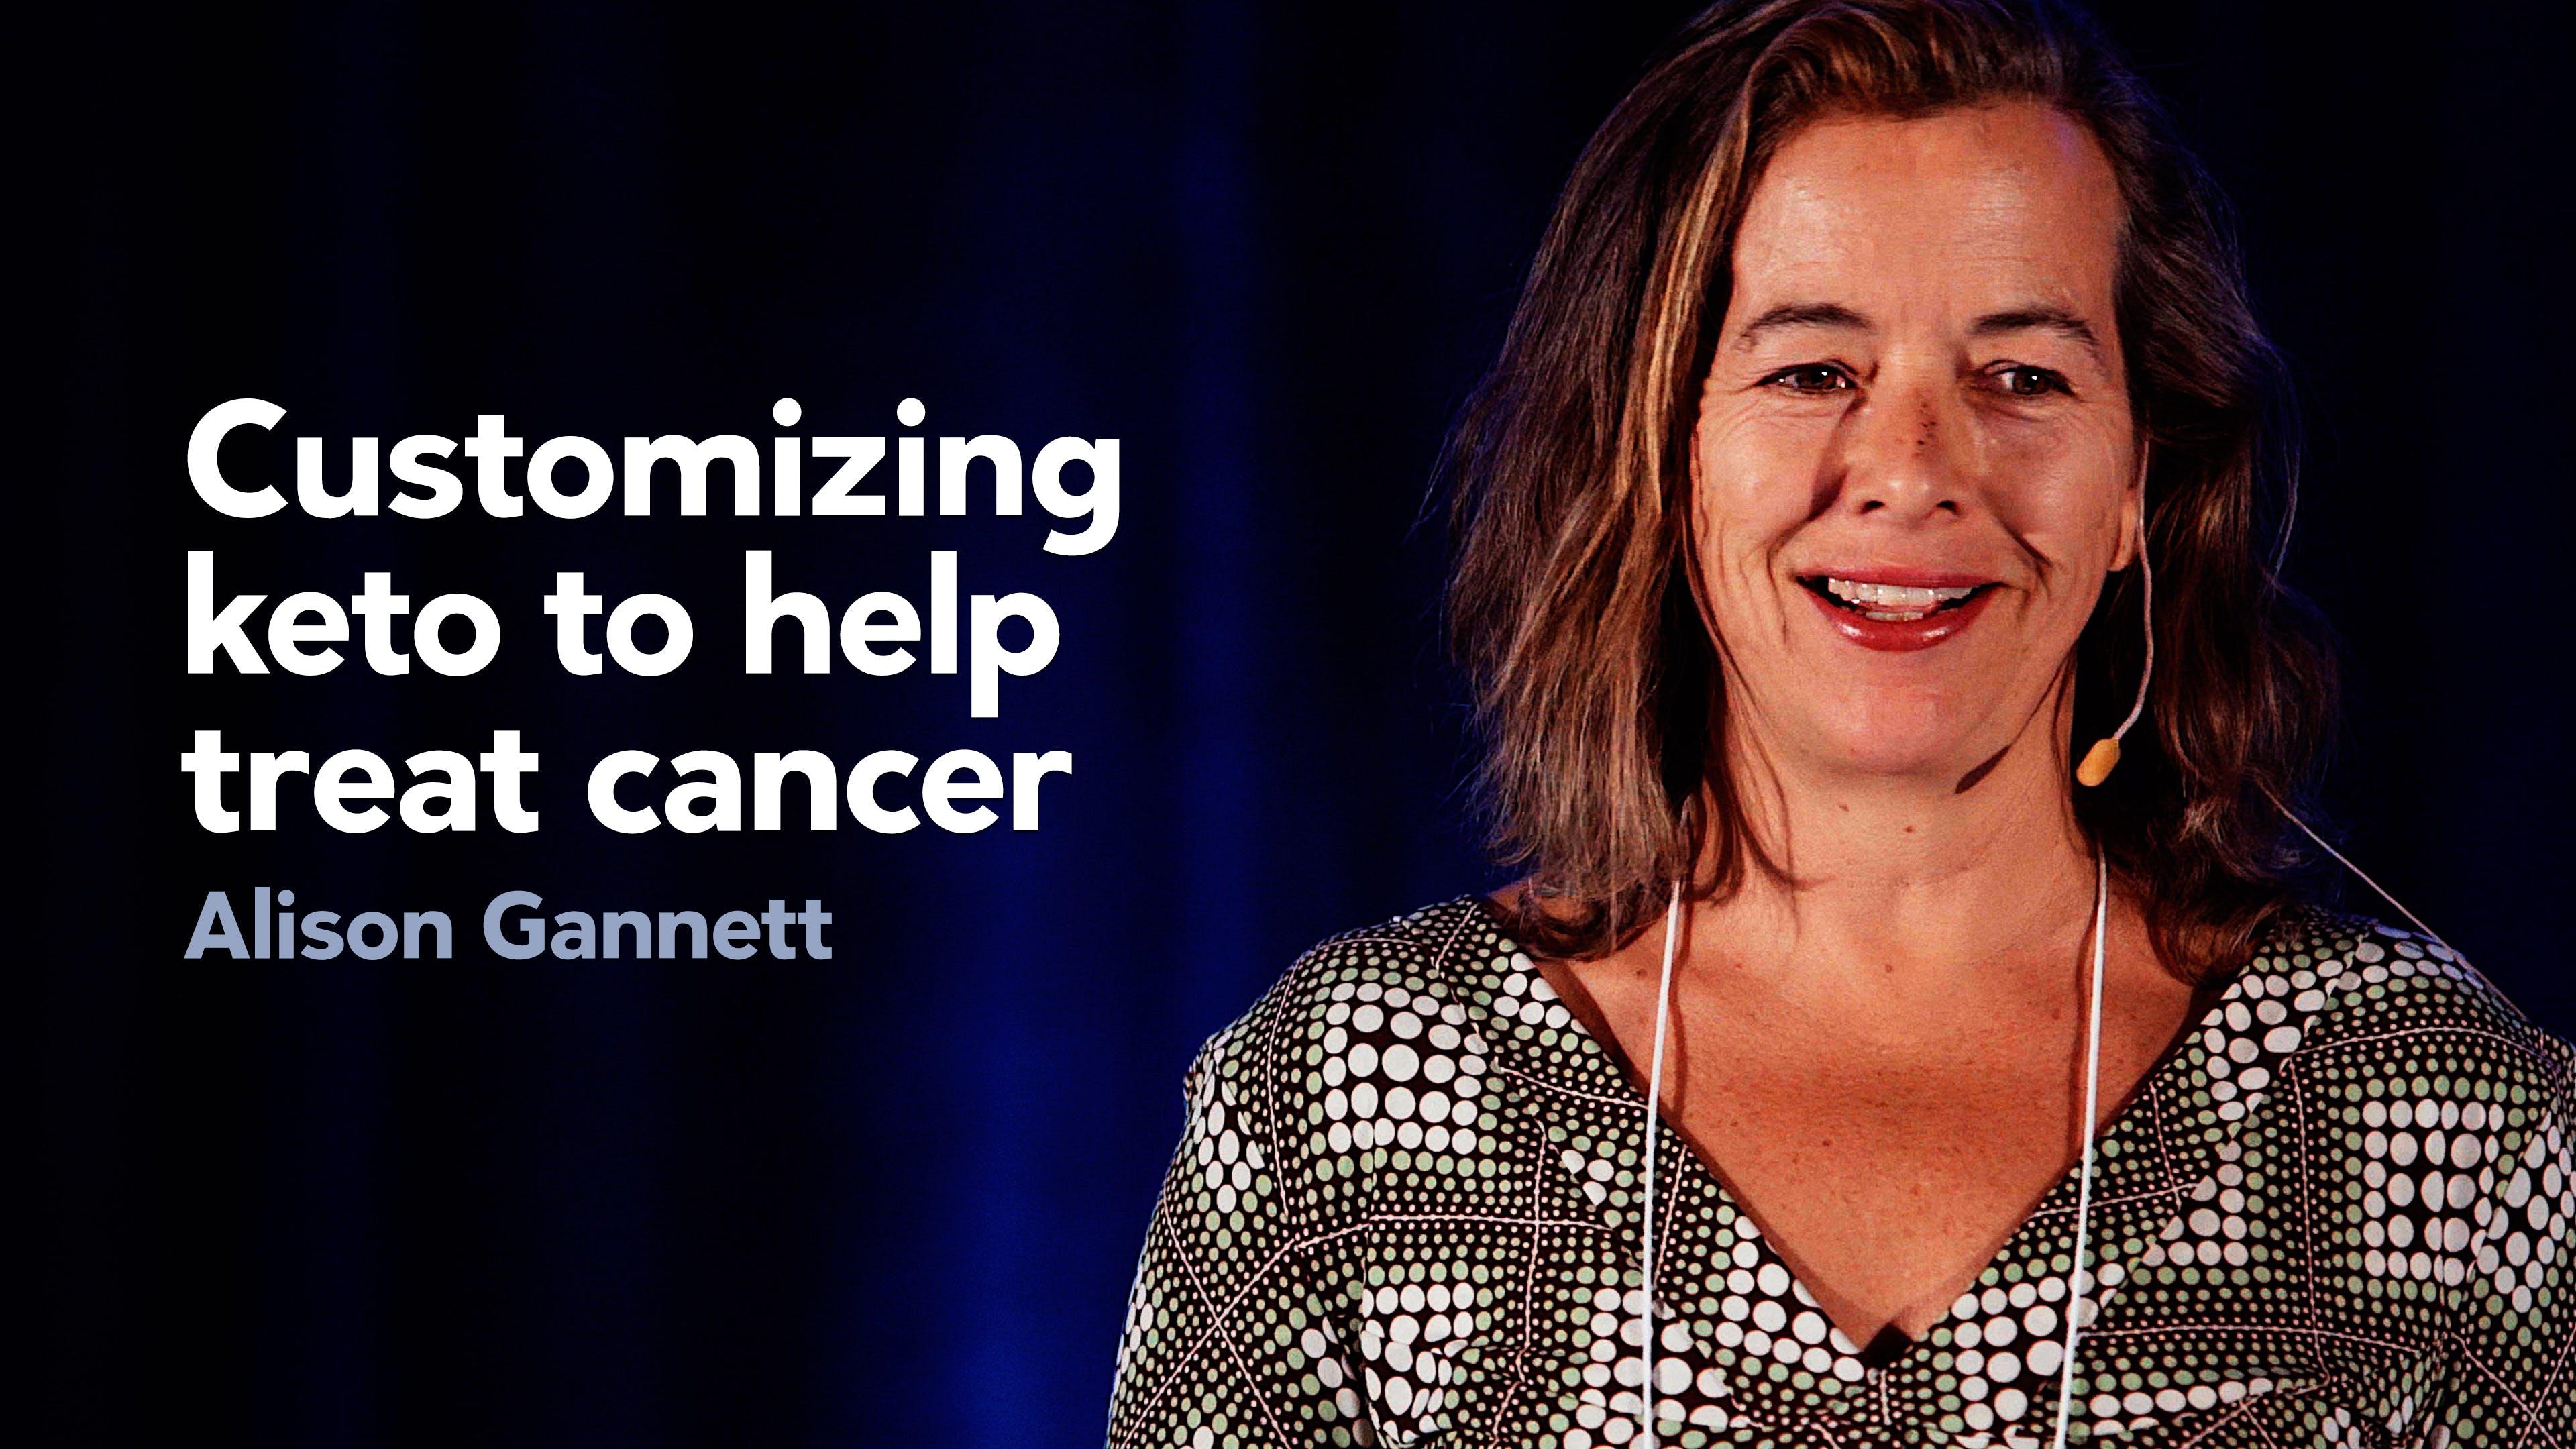 Customizing keto to help treat cancer